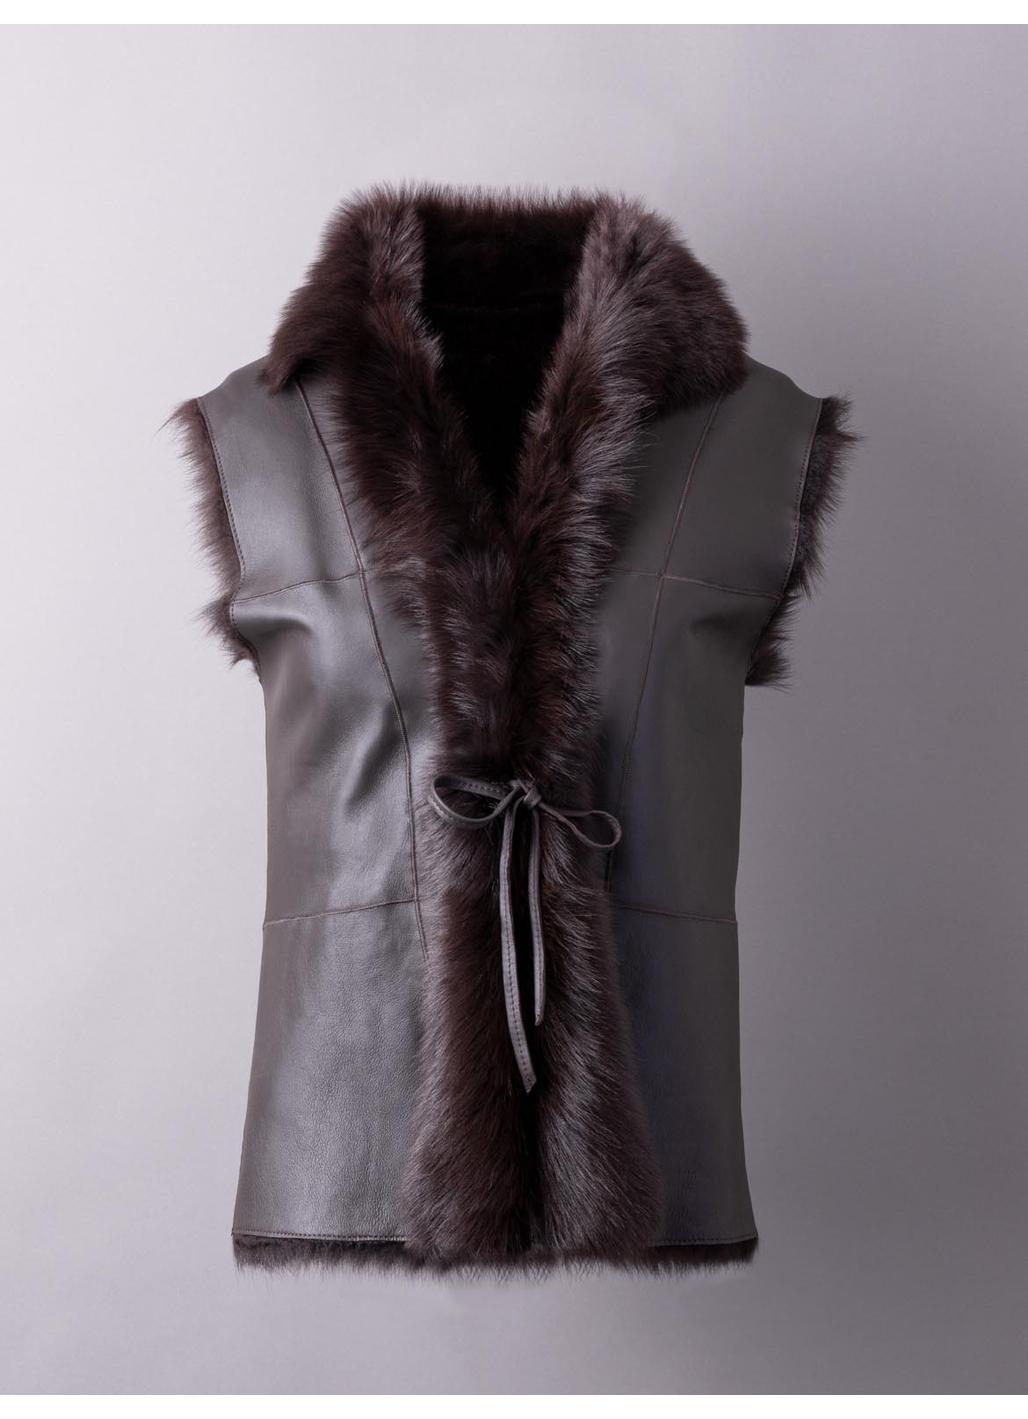 Sedgwick Toscana Sheepskin Gilet in Dark Brown